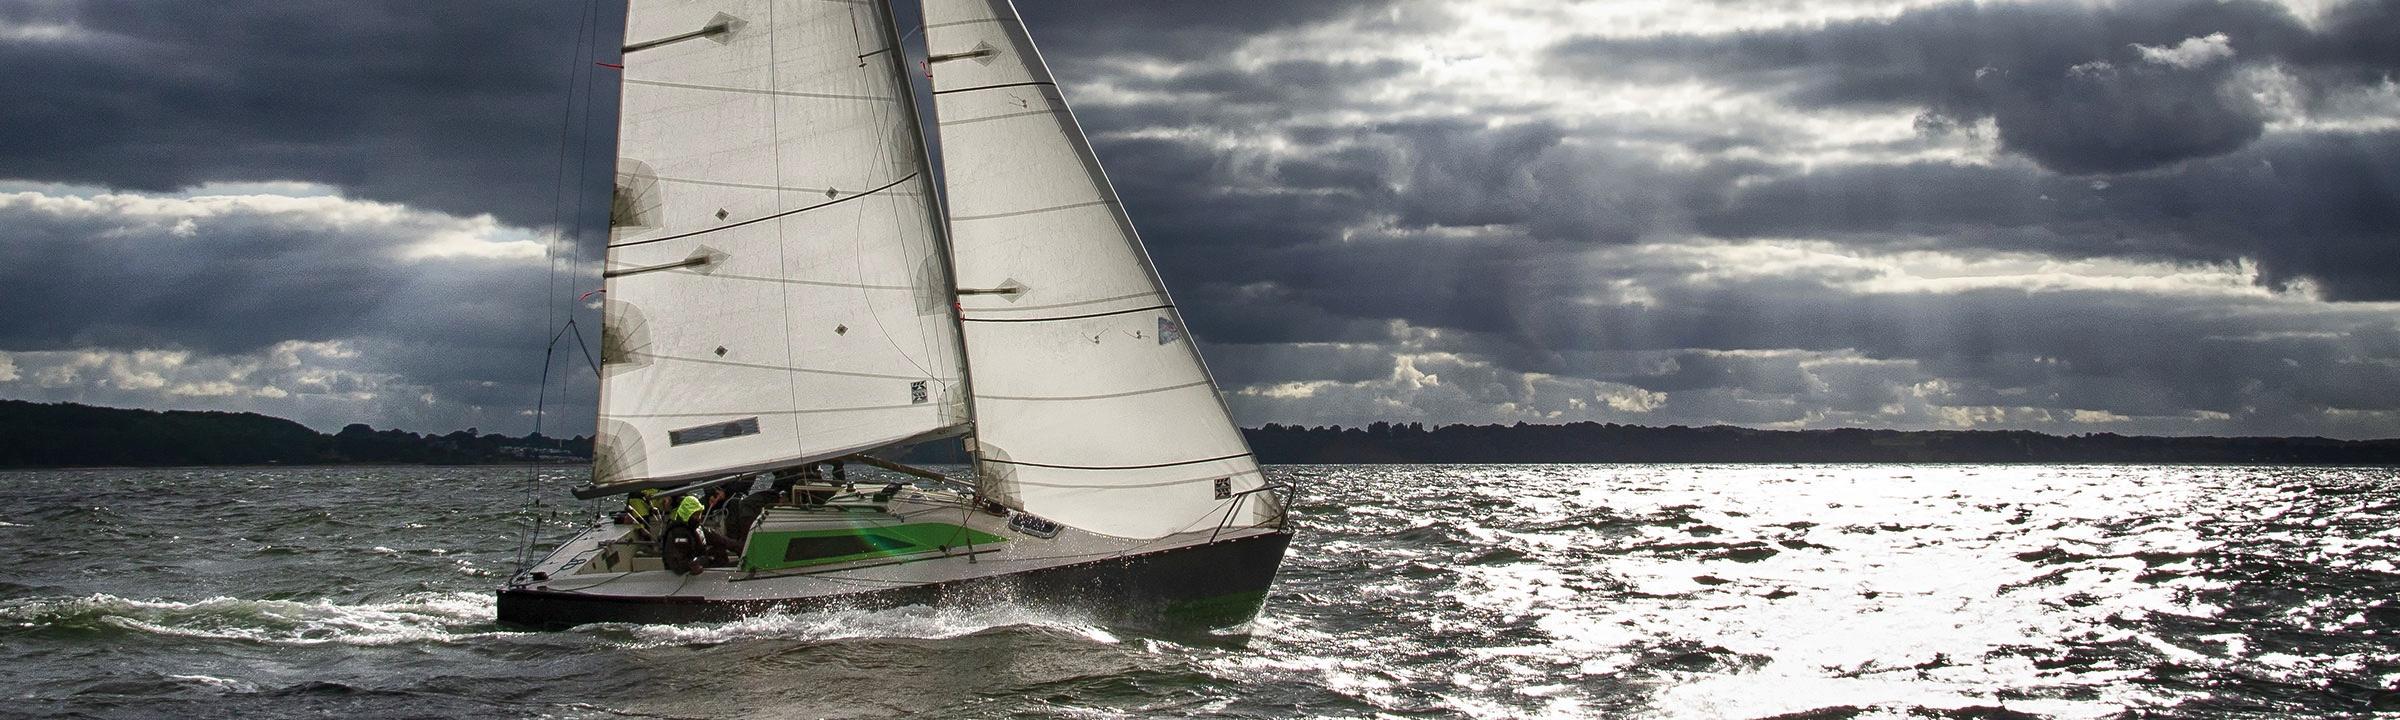 Yachtclub Langballigau e.V.